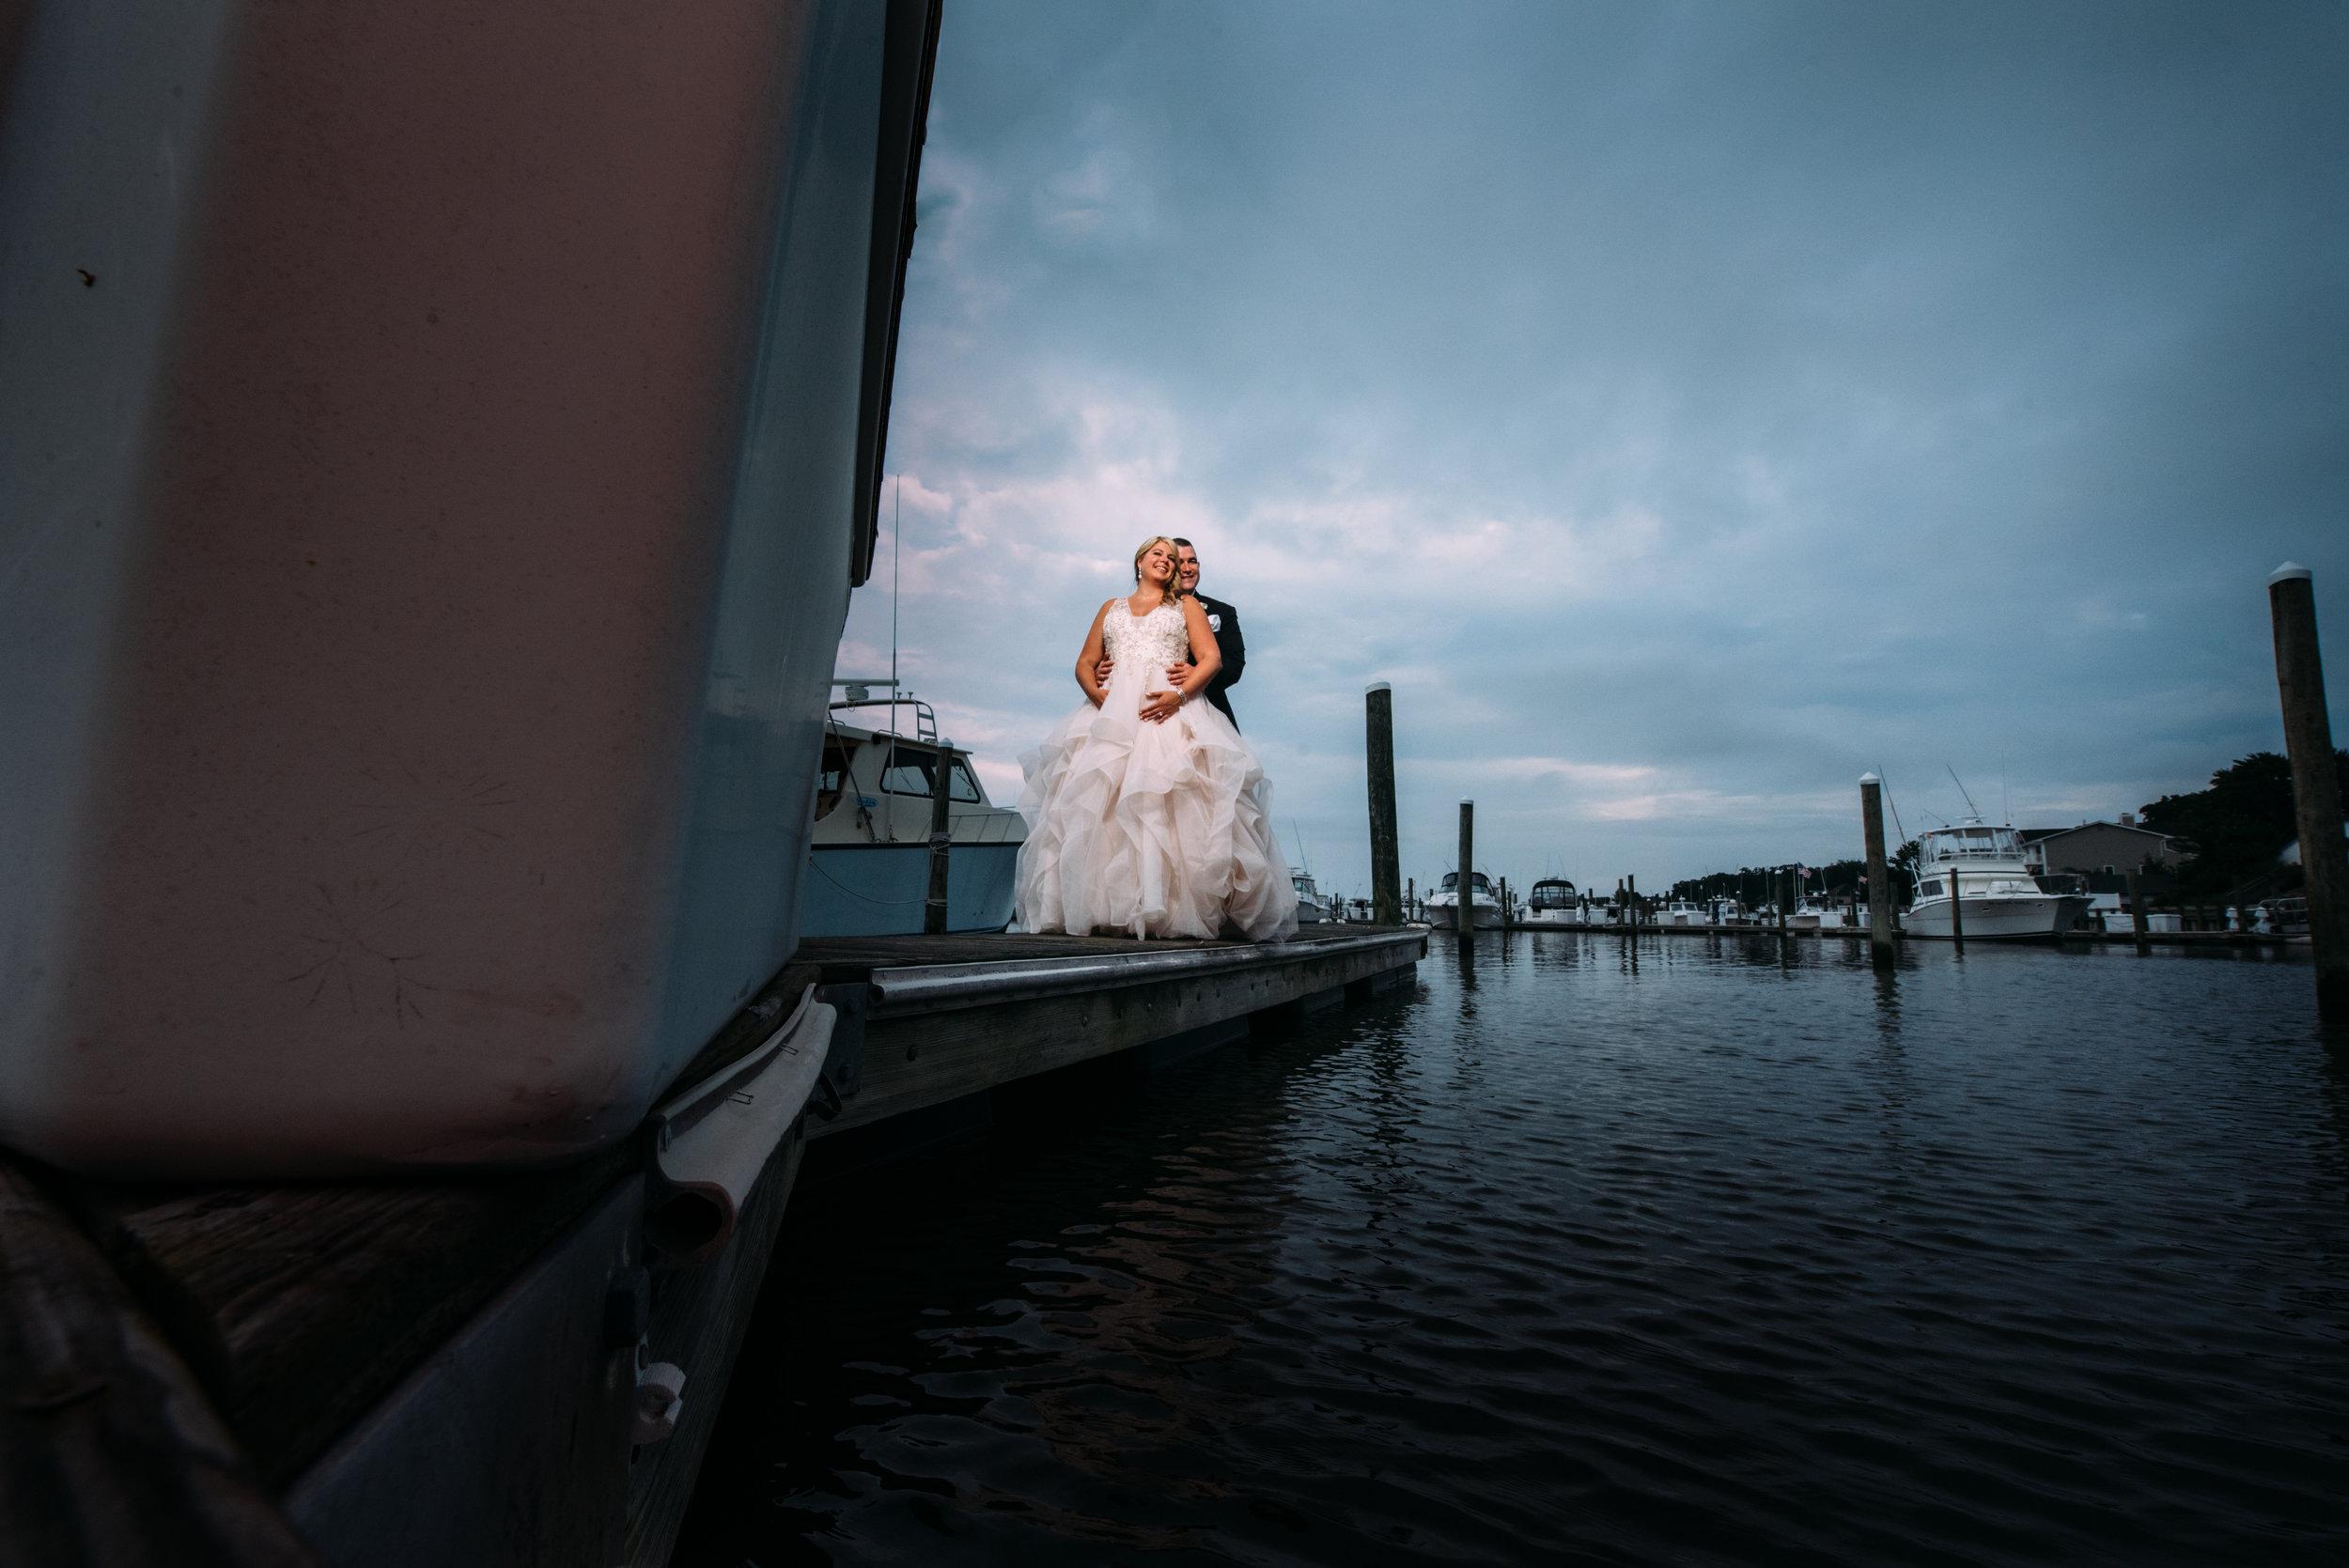 WeddingPhotos | NJPhotographer | Highlights-6-13.jpg